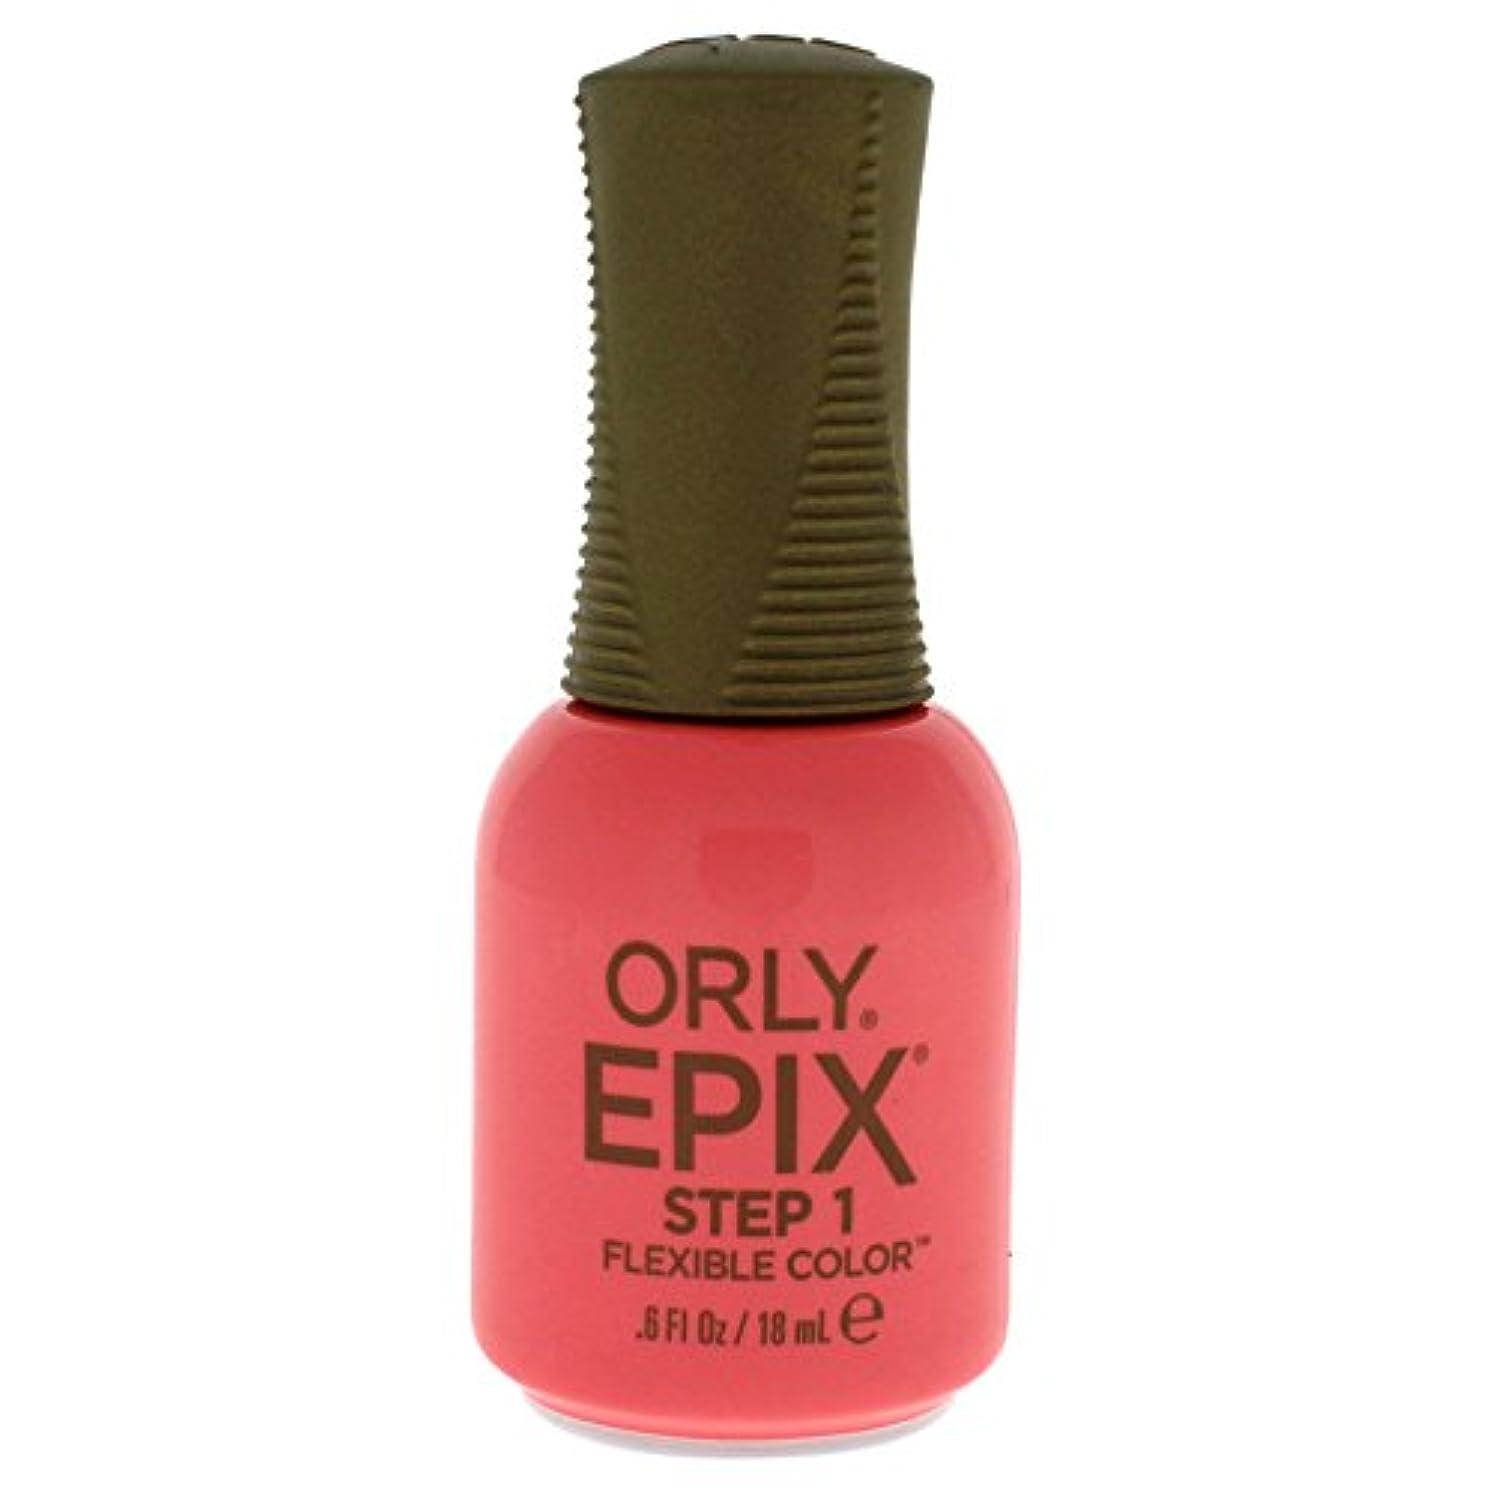 Orly Epix Flexible Color Lacquer - Trendy - 0.6oz/18ml